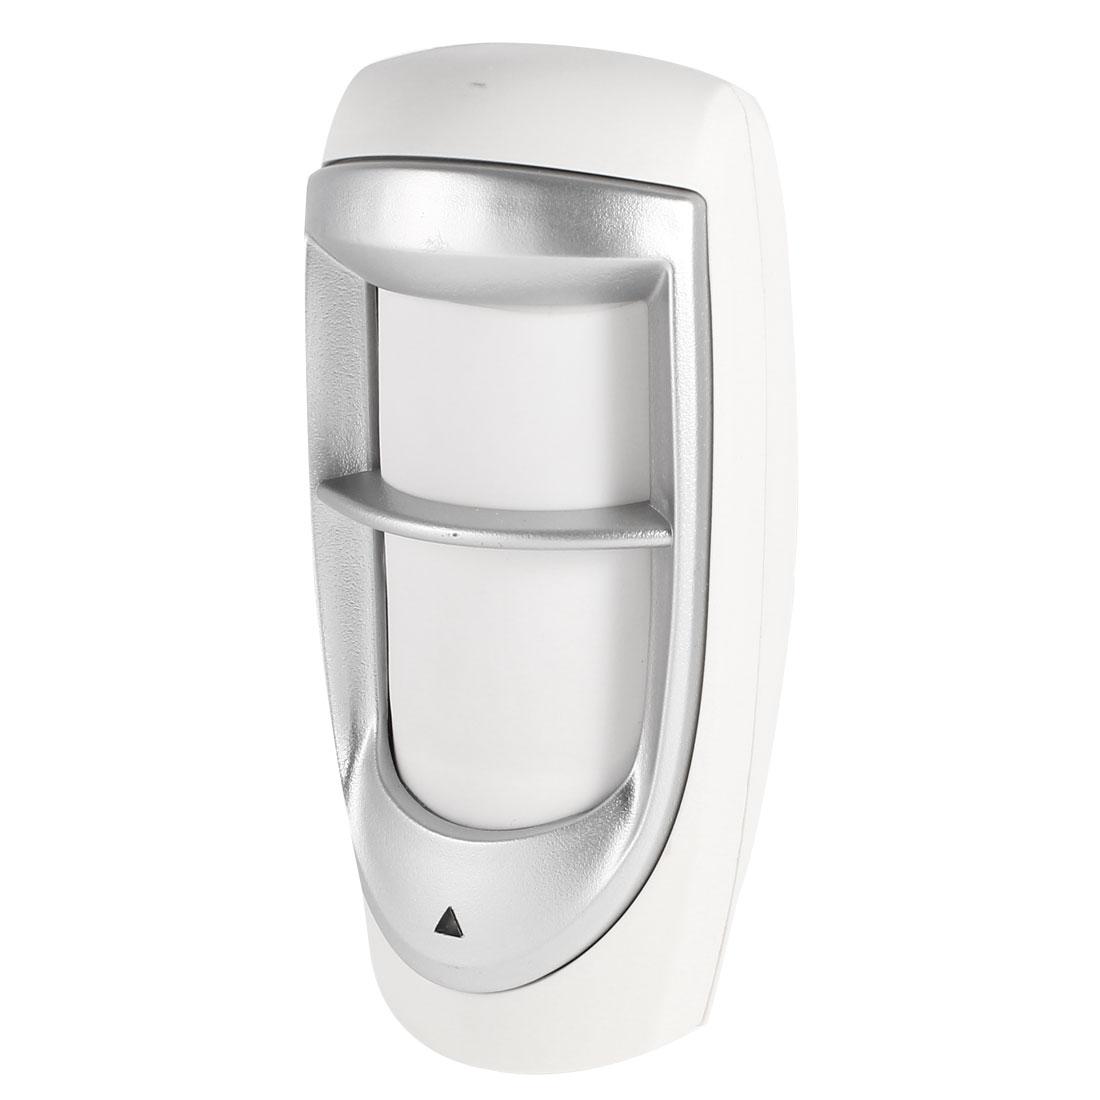 Outdoor Pet Immunity PIR Sensor Dual Element Infrared Motion Detector Alarm